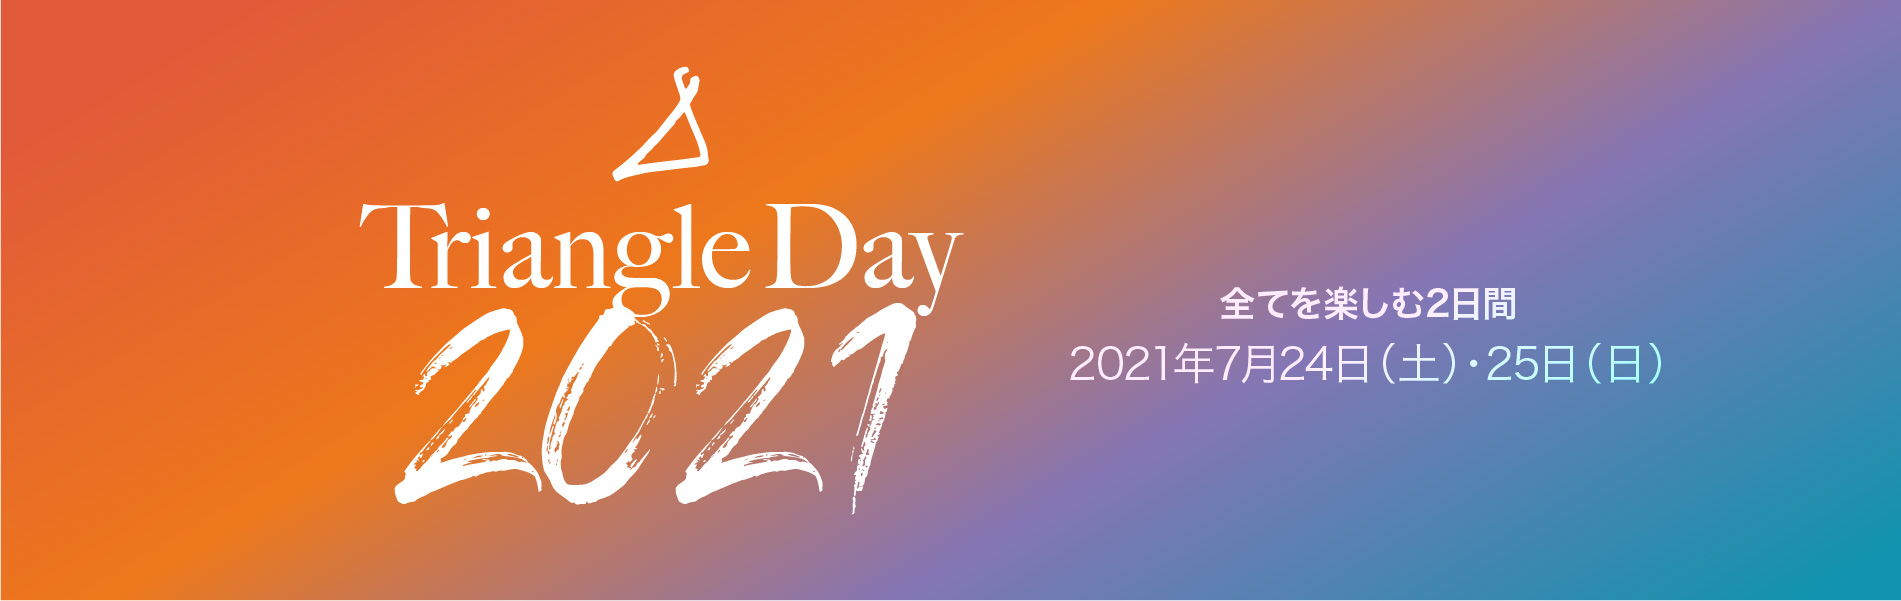 Triangle Day